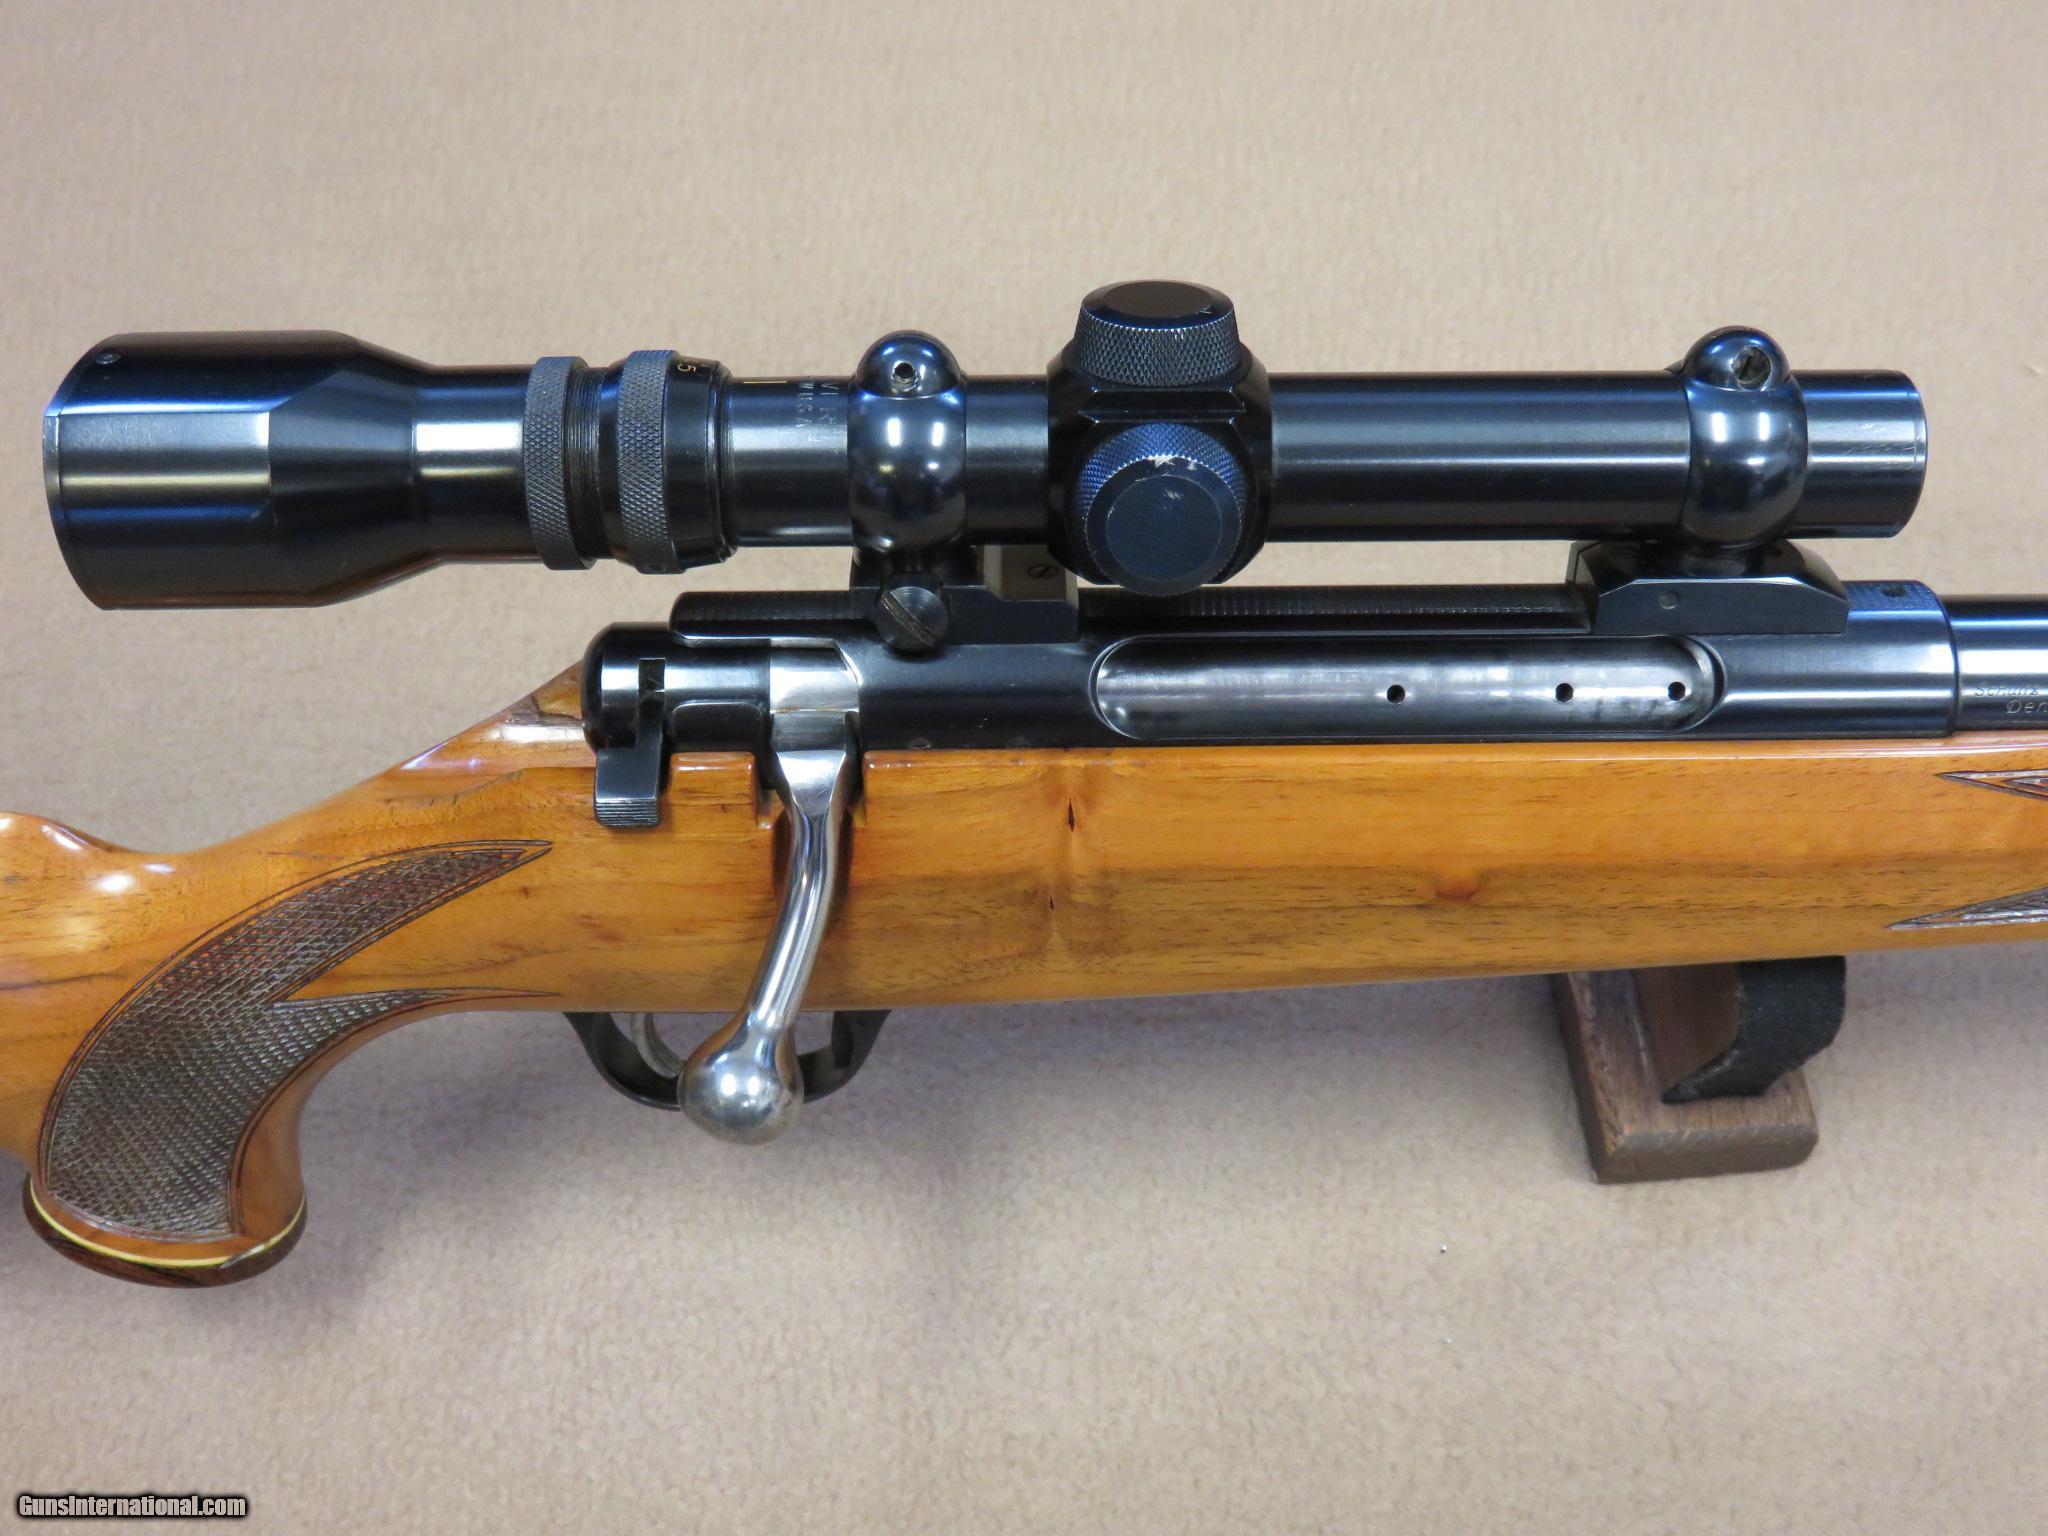 antique/vintage scope value? The